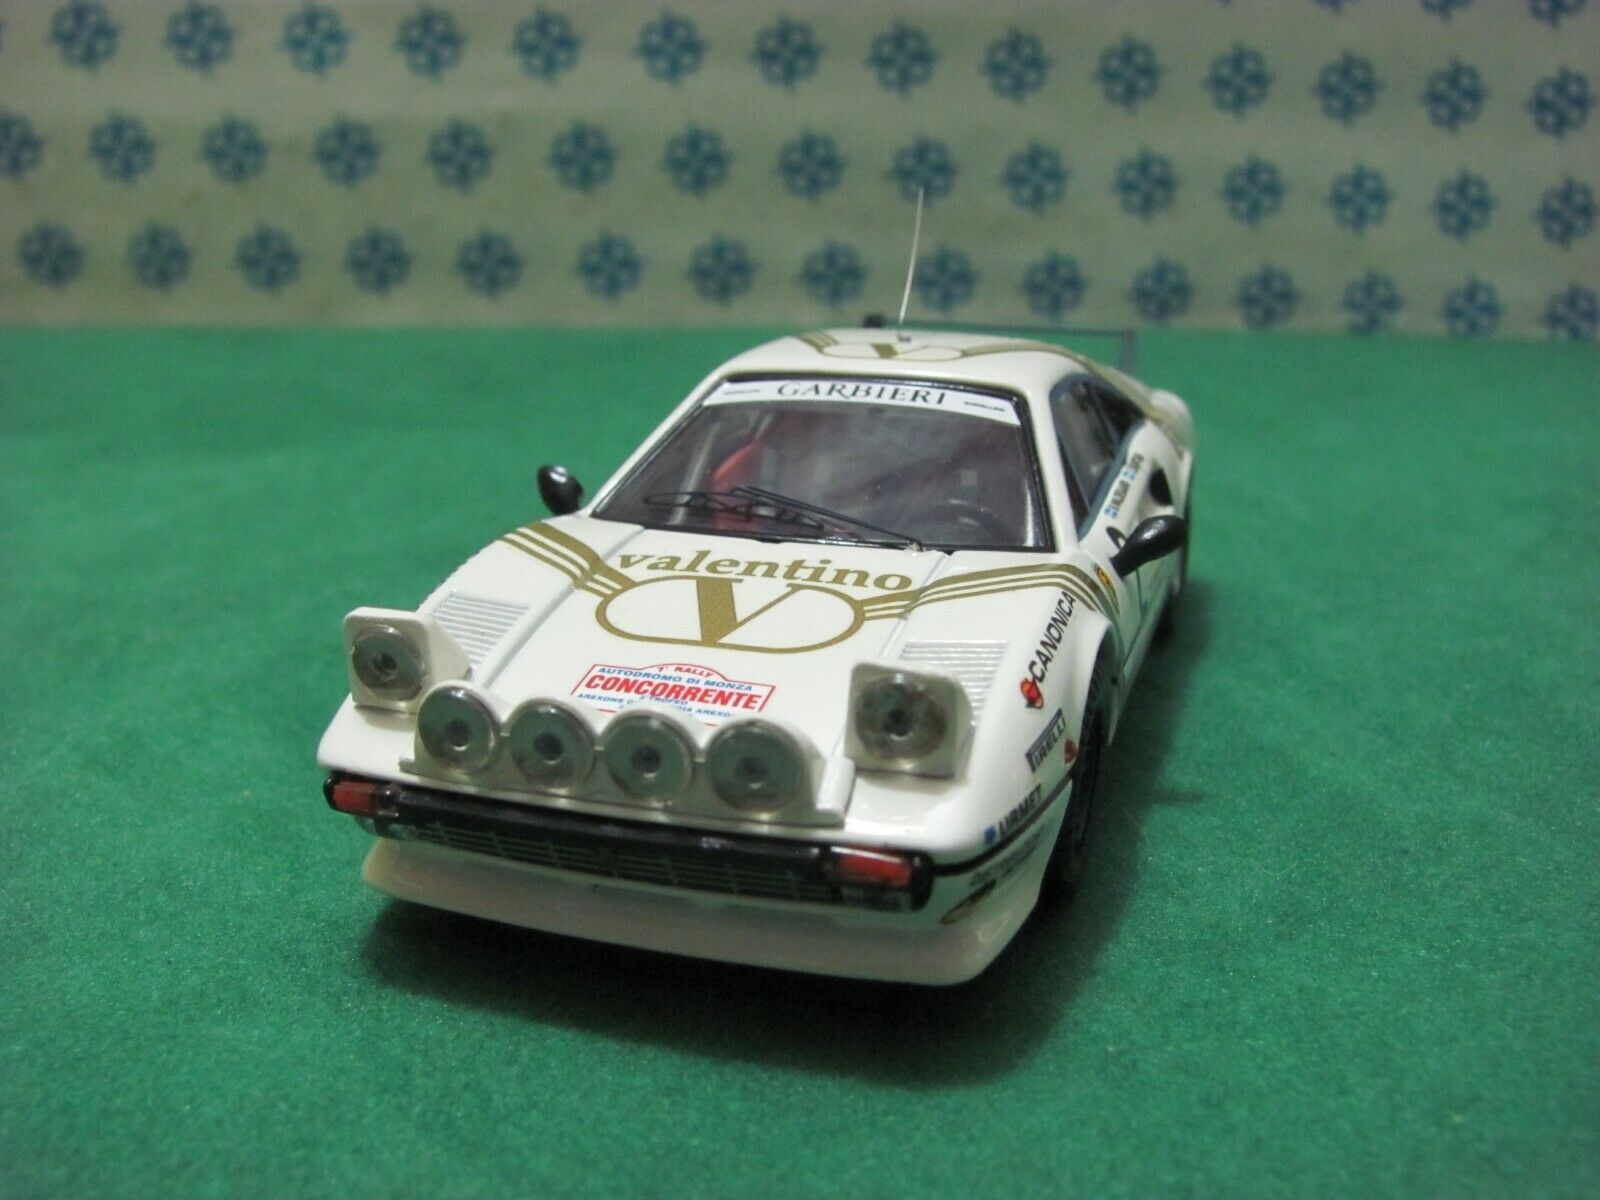 FERRARI 308 GTB PR 3000cc. coupè   Monza 1984    - 1 43 Best 9354